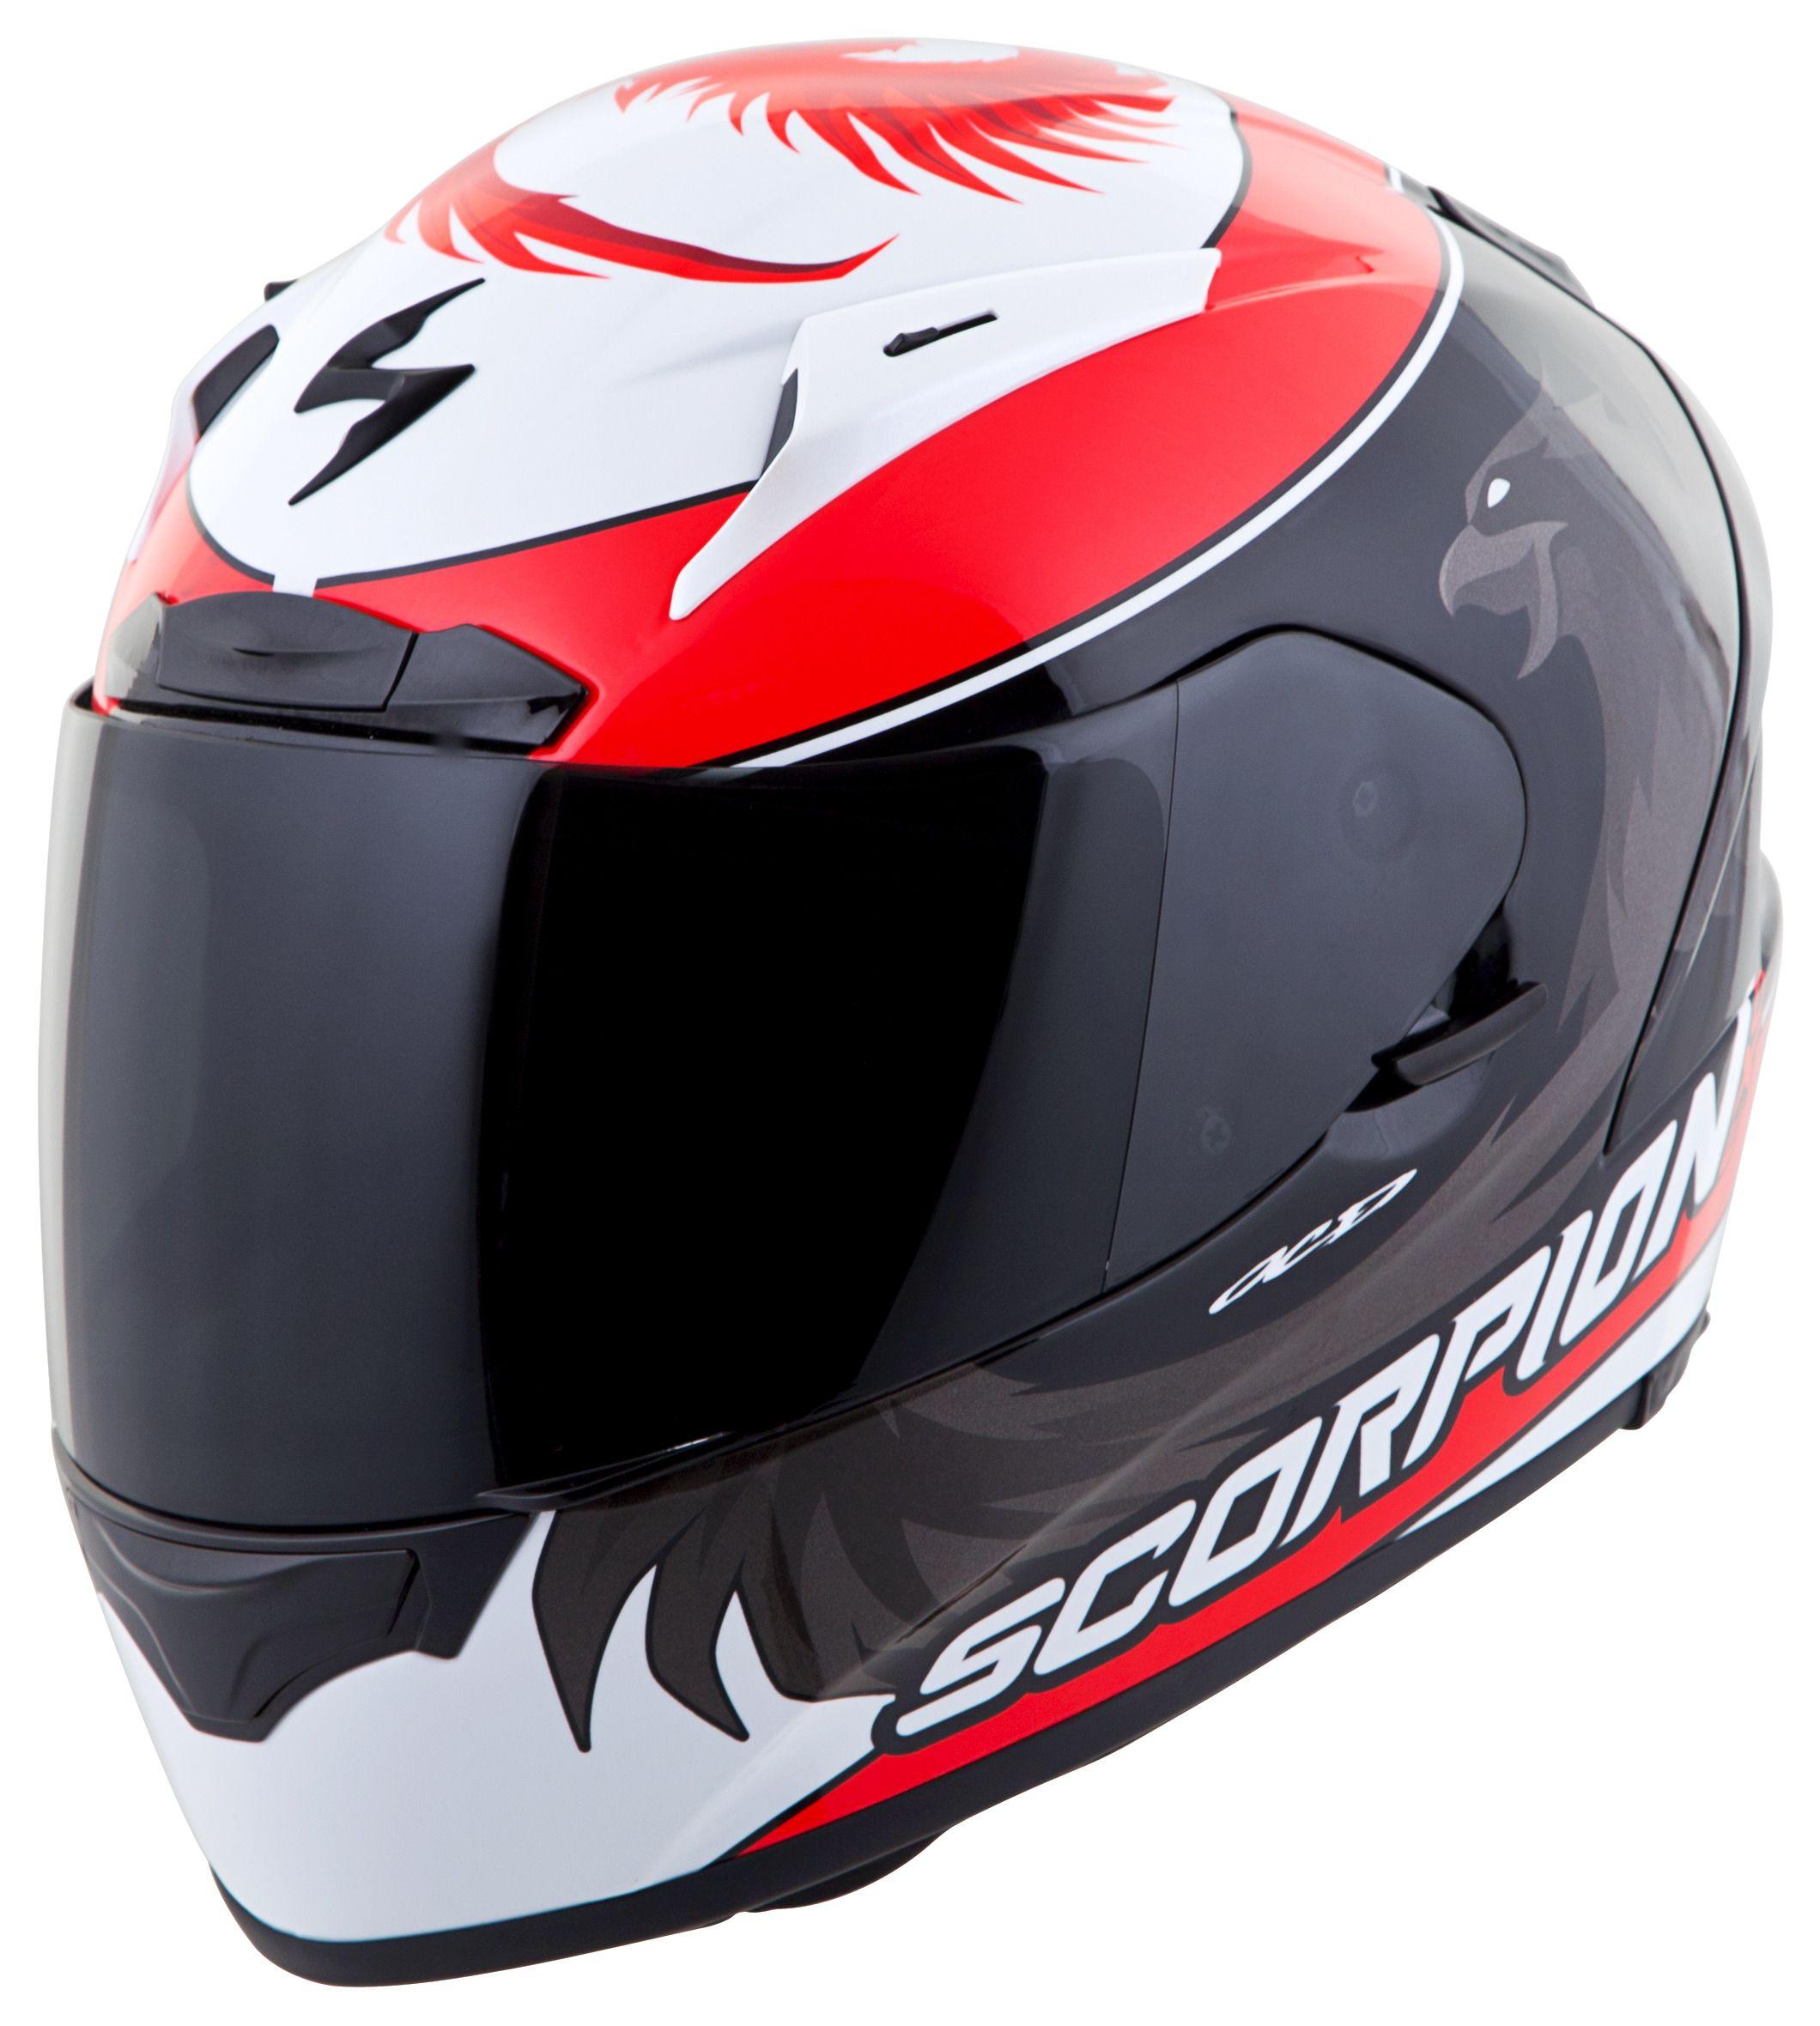 scorpion exo r2000 masbou helmet revzilla. Black Bedroom Furniture Sets. Home Design Ideas